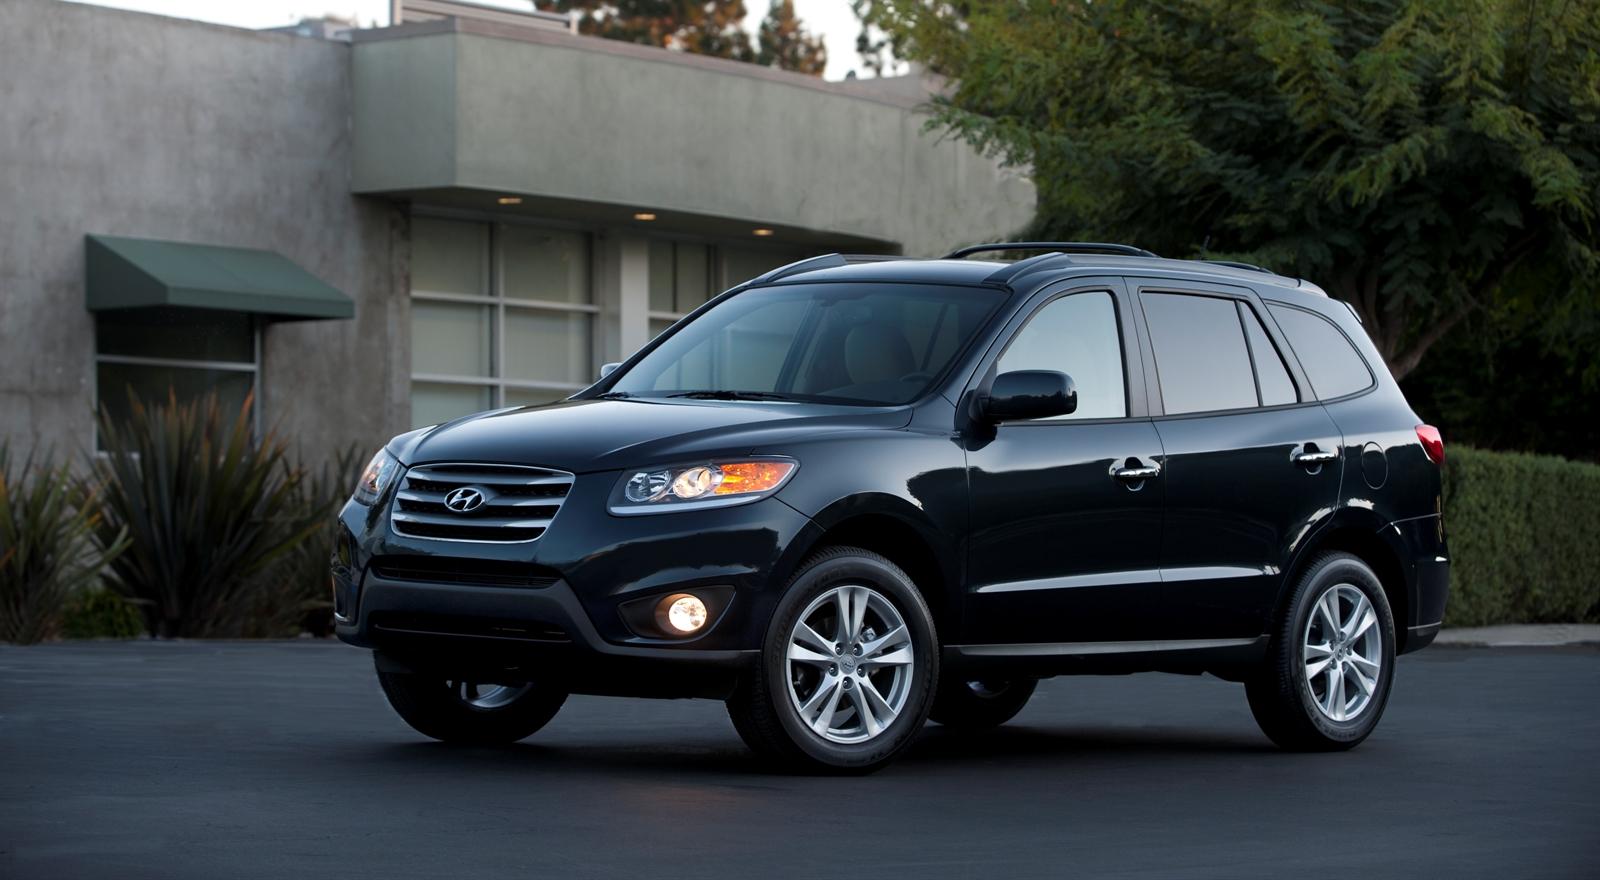 2013 Hyundai Santa Fe Confirmed For 2012 New York Auto Show